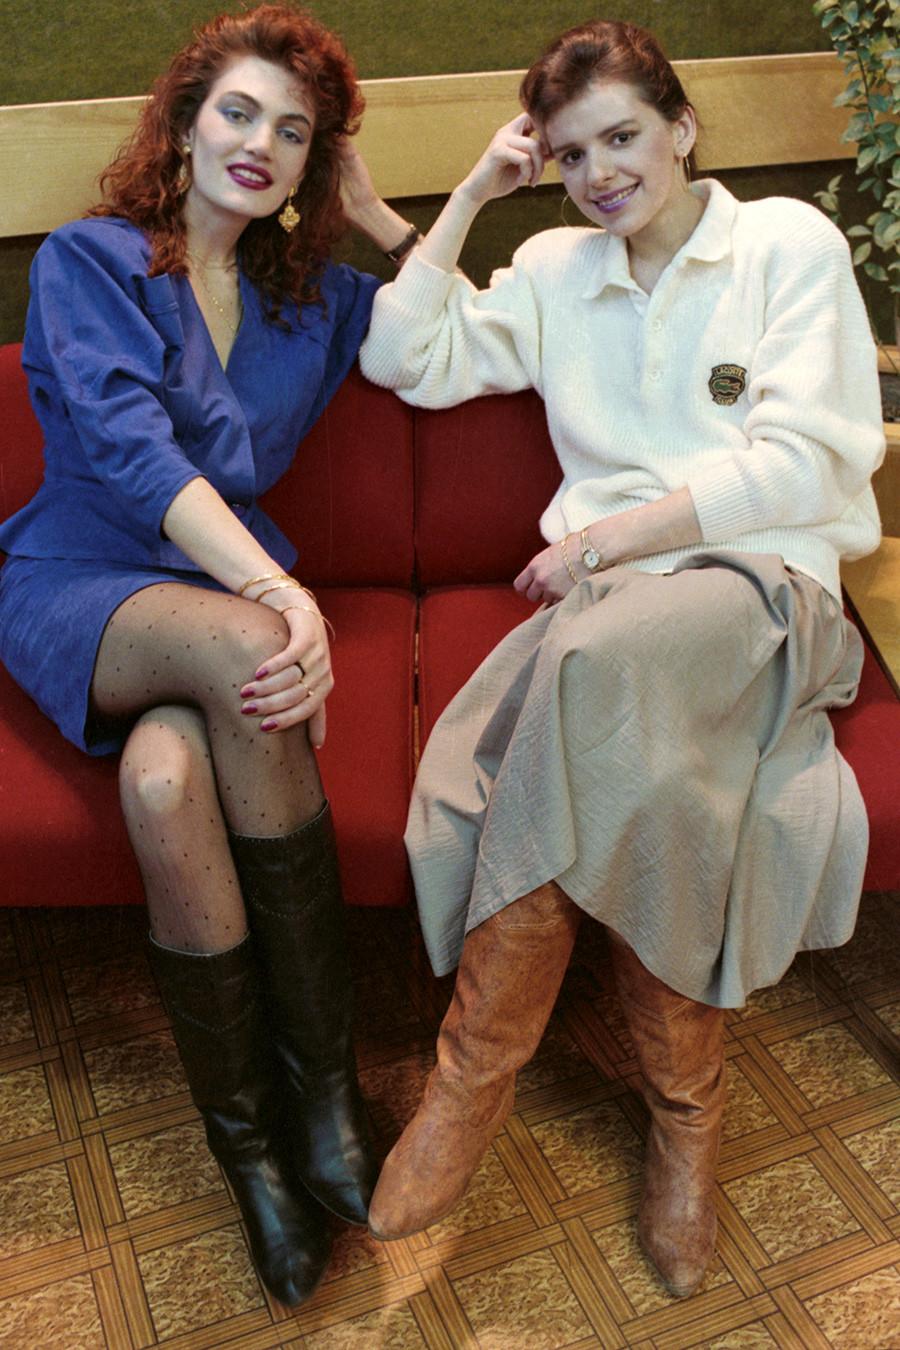 Olga Shnaibel, directora de la agencia de modelos Matrena y la manager Elena Alímova.